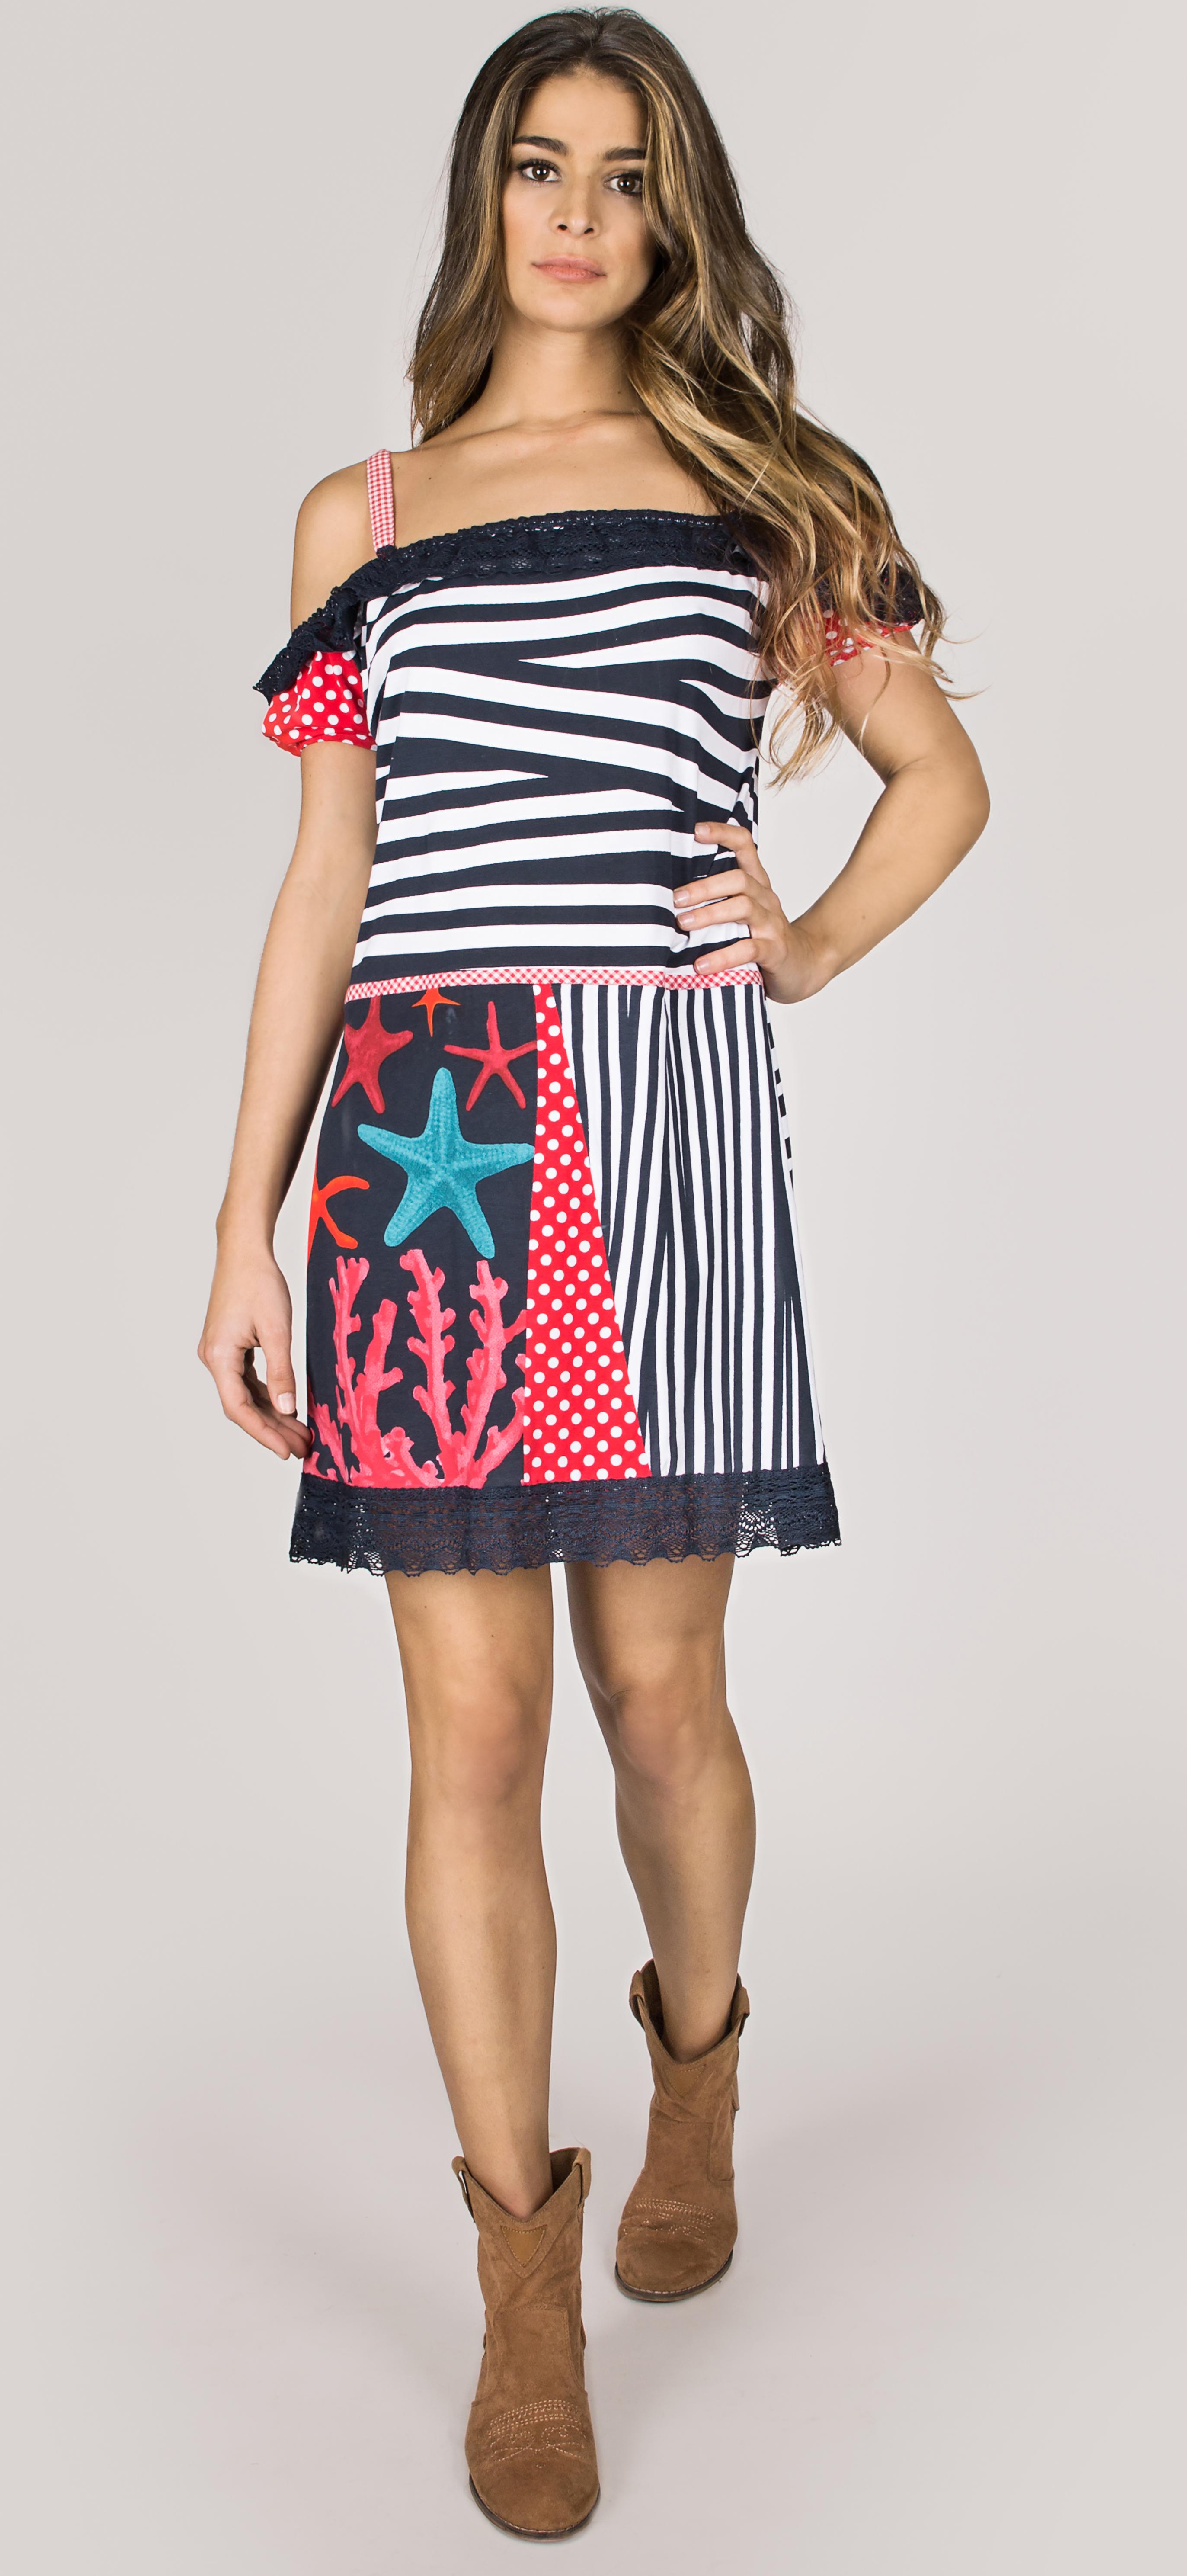 Shoklett Spain: Pink Coral Cotton Ruffled Short Dress Zoey SHOKLETT_10082S19DR